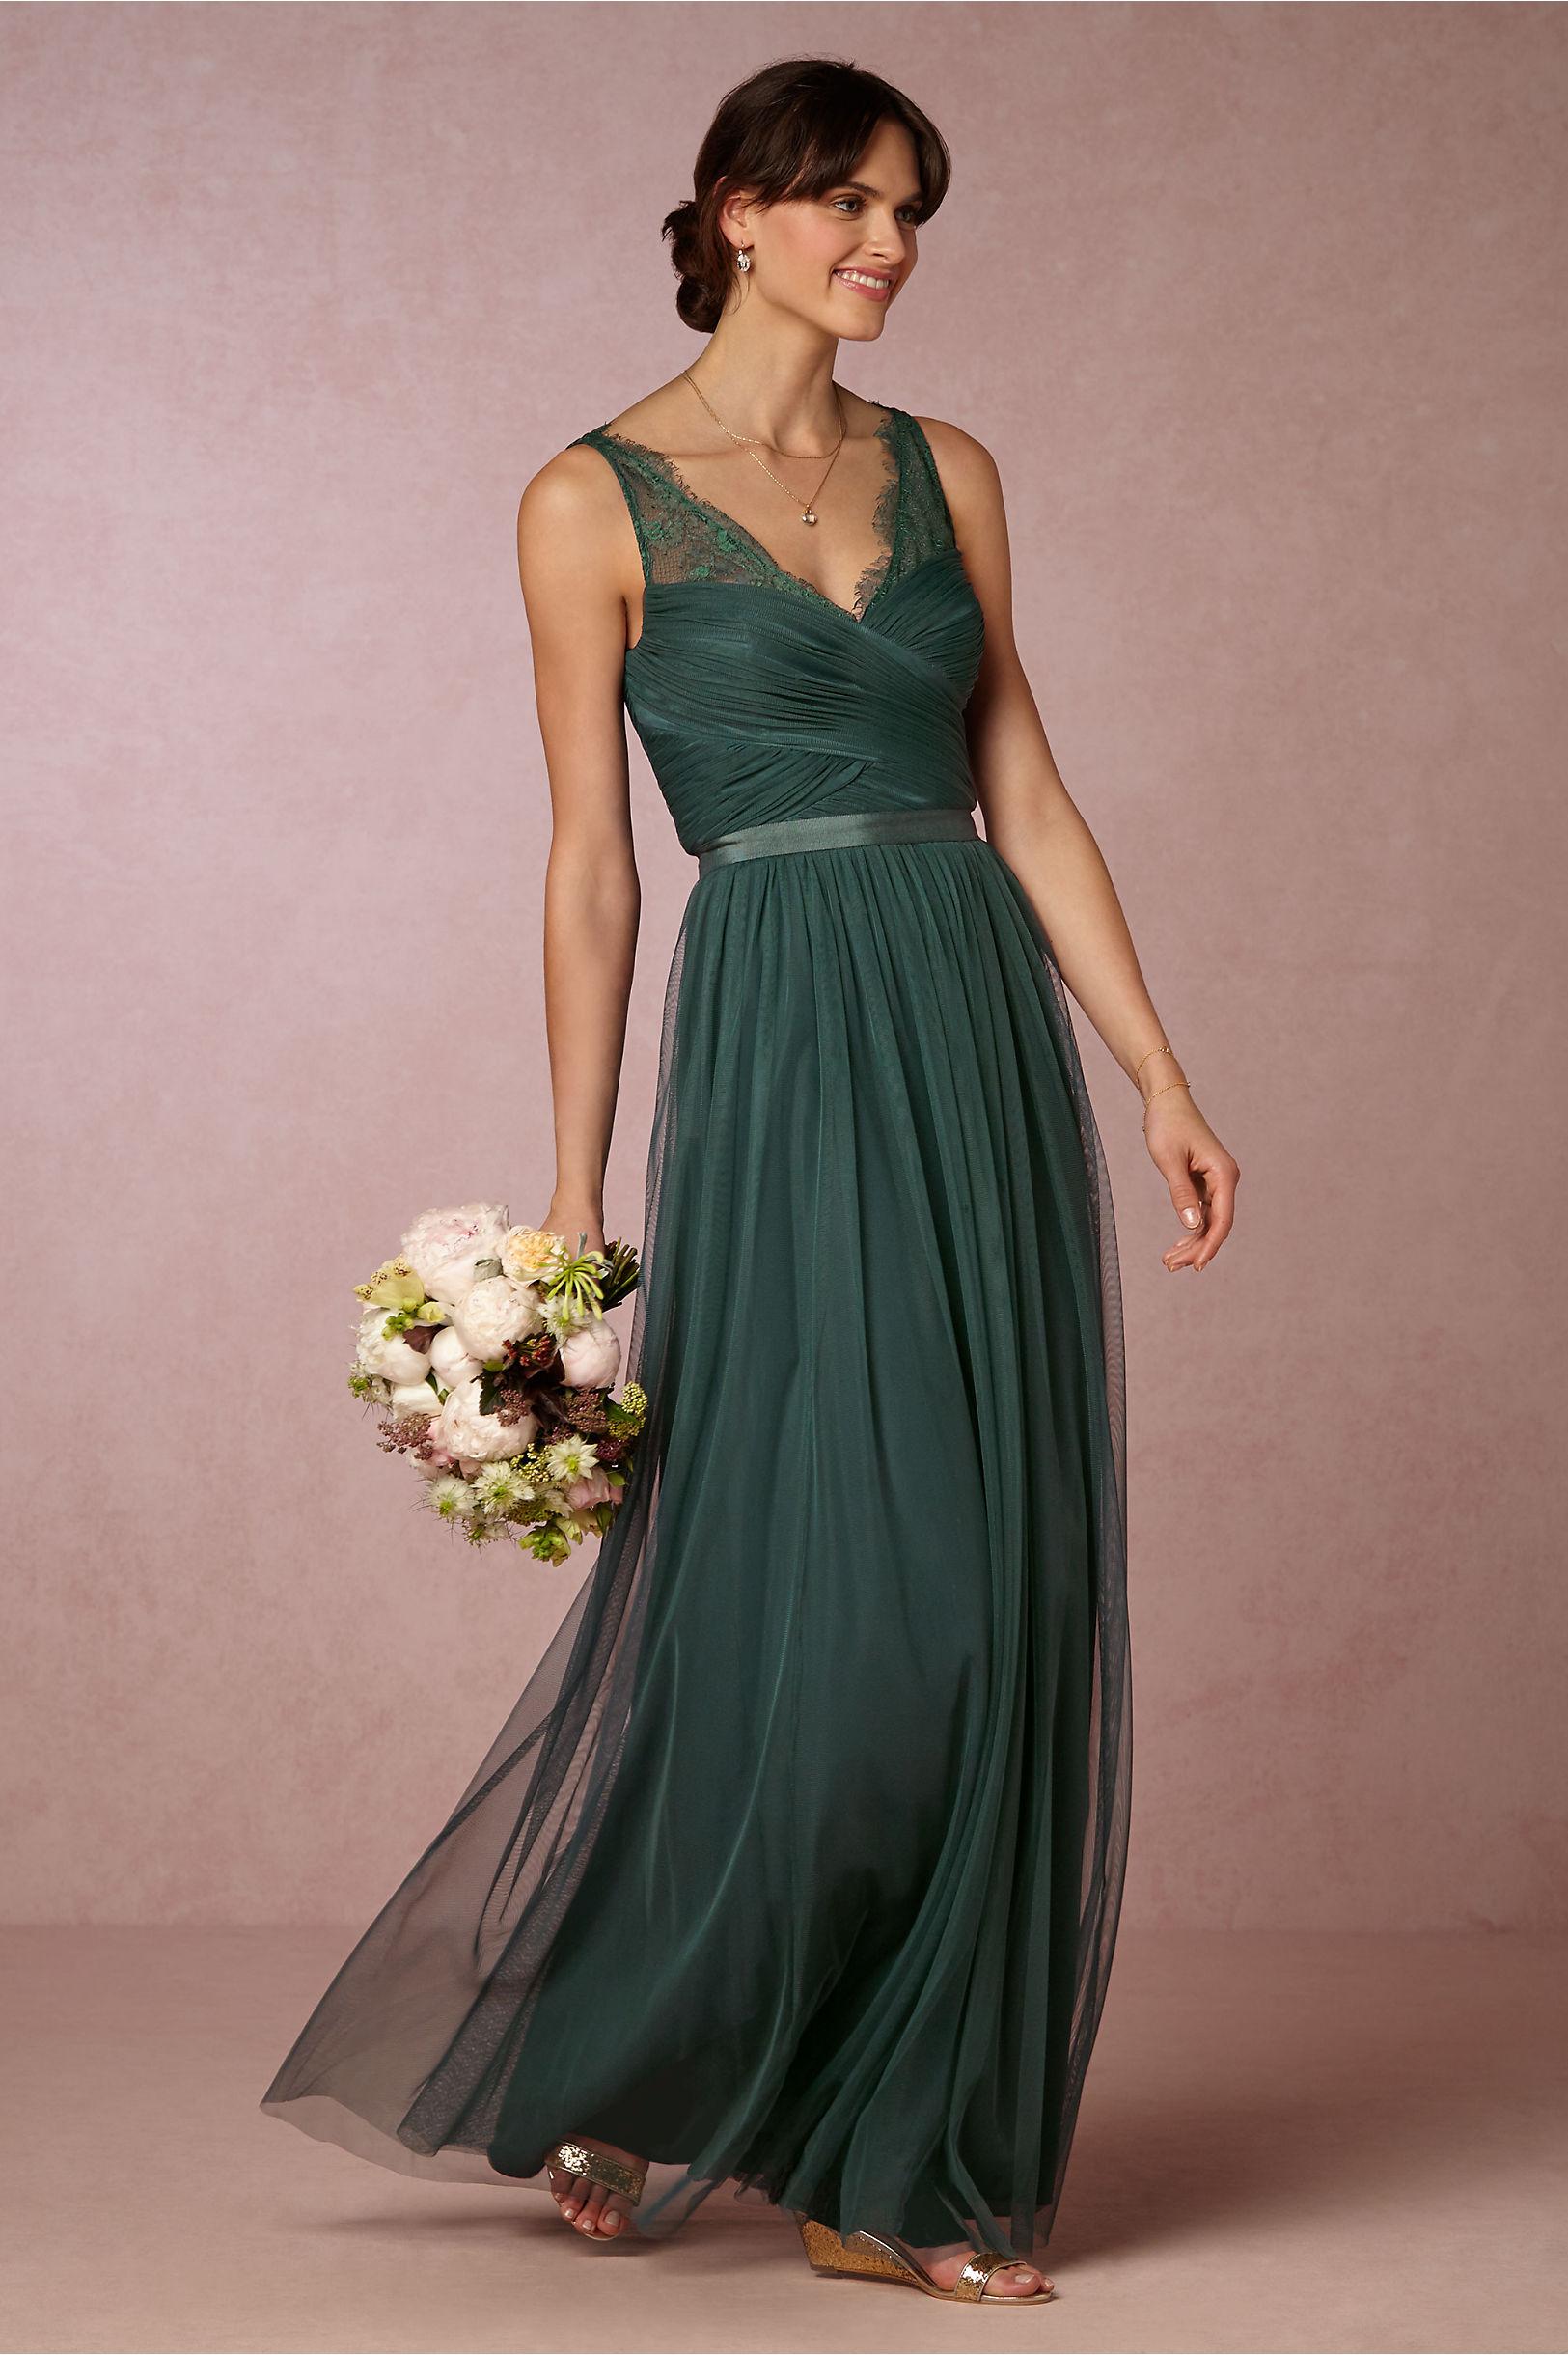 Fleur Dress in Sale | BHLDN